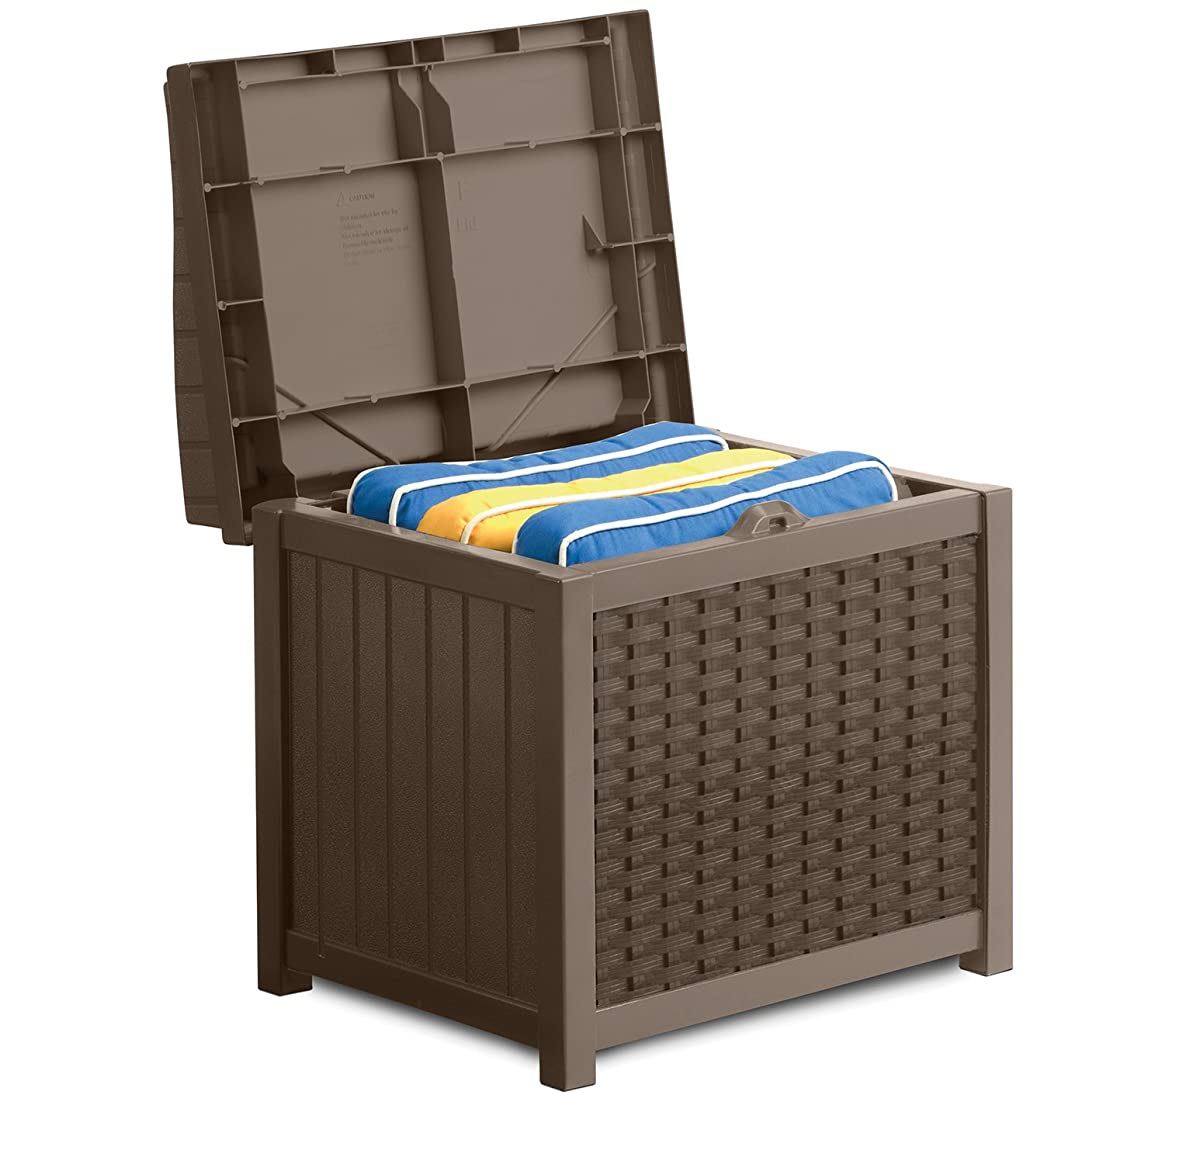 Suncast SSW1200 Mocha Resin Wicker 22-Gallon Storage Seat